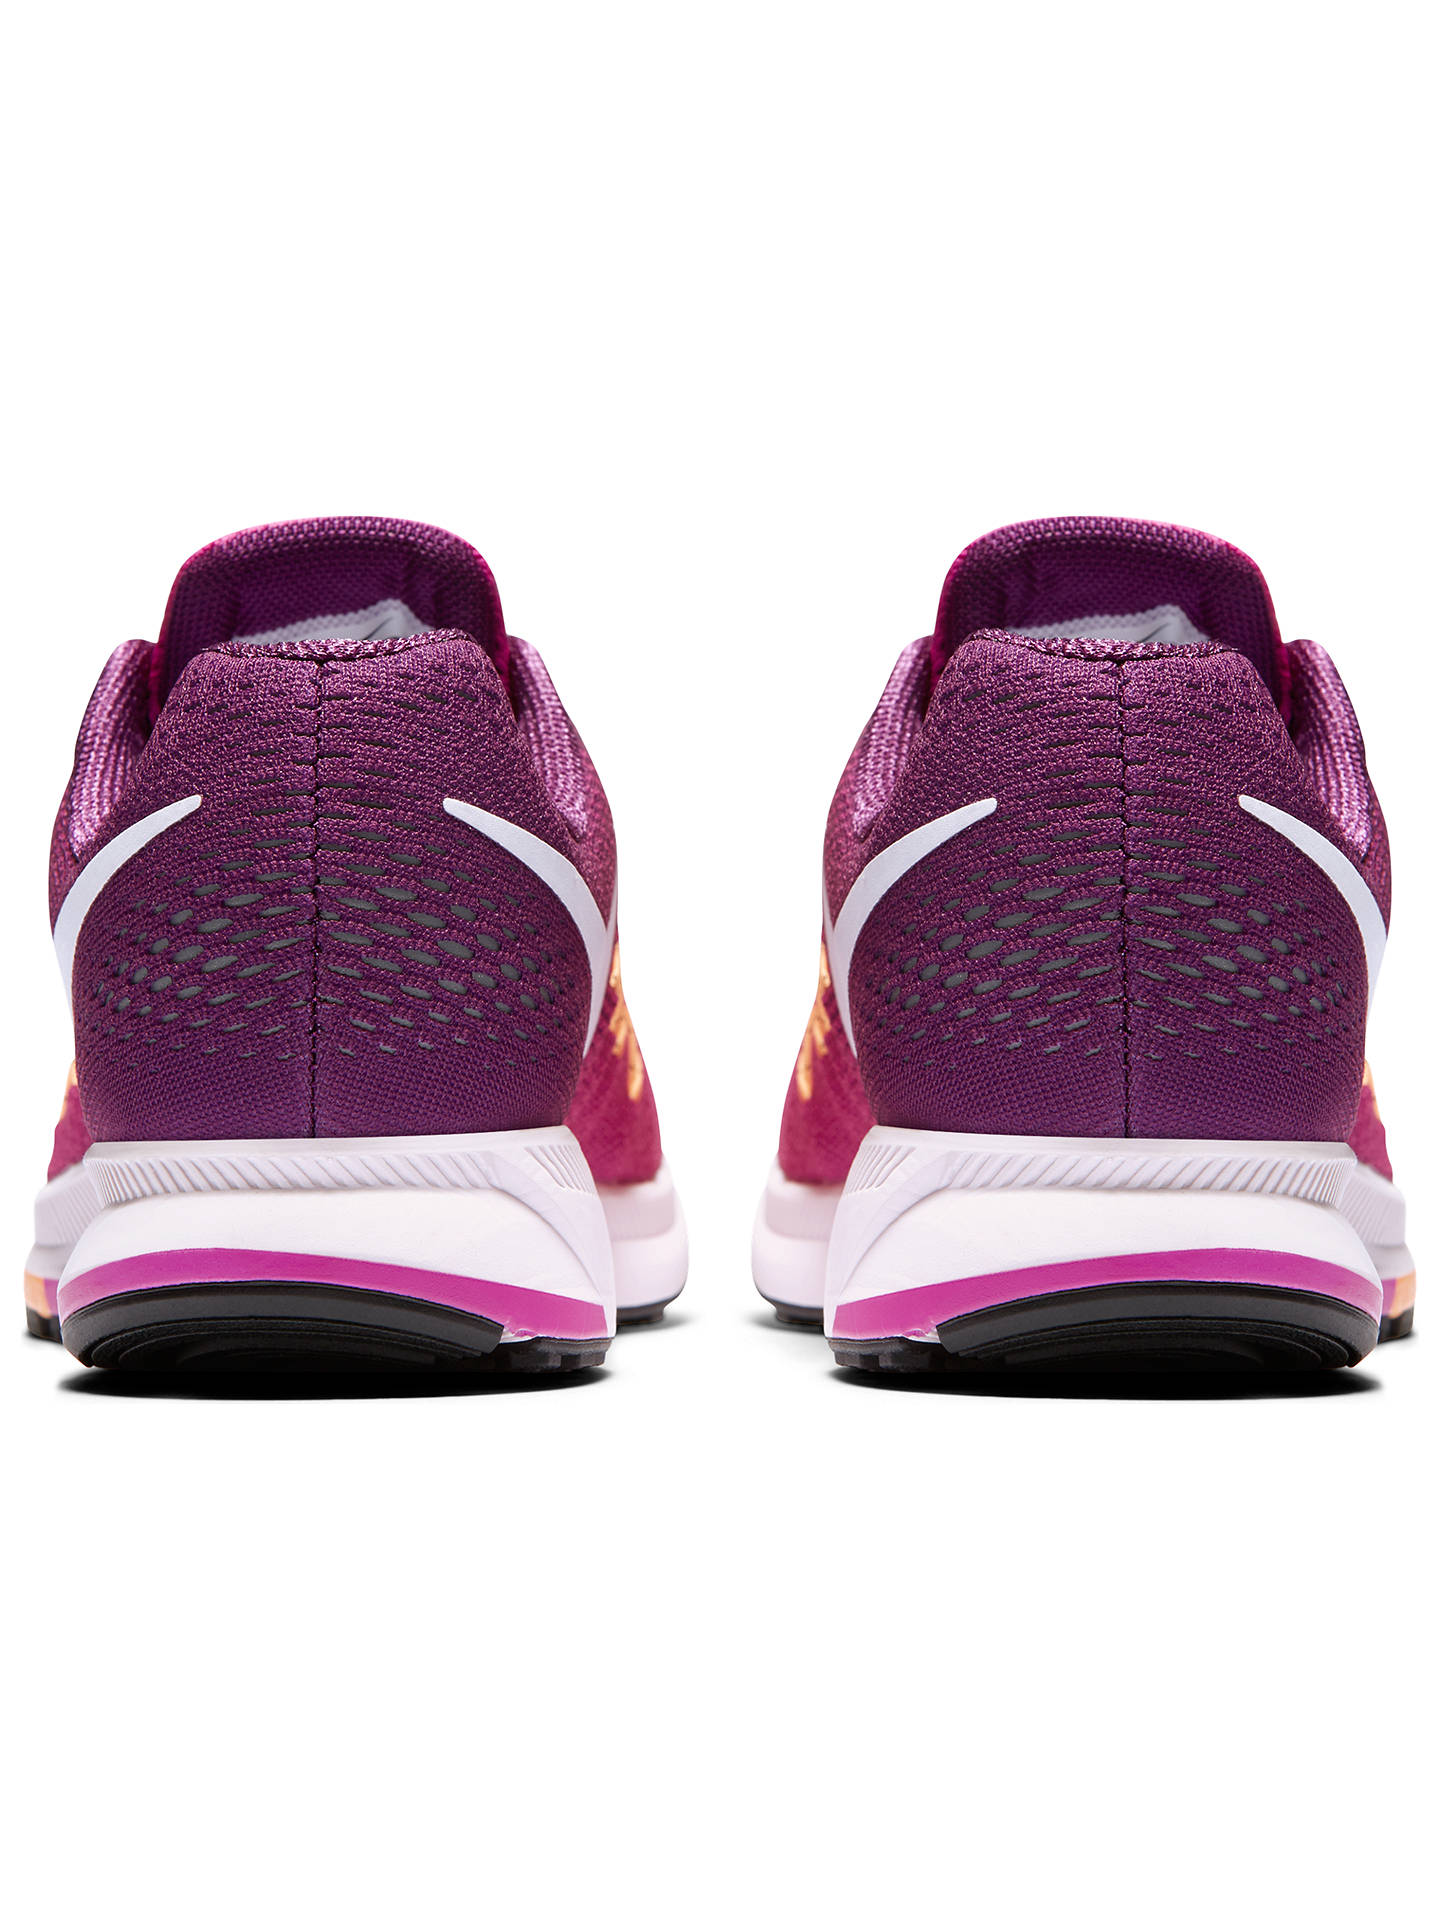 cccbe2f088f0 ... Buy Nike Air Zoom Pegasus 33 Women s Running Shoes